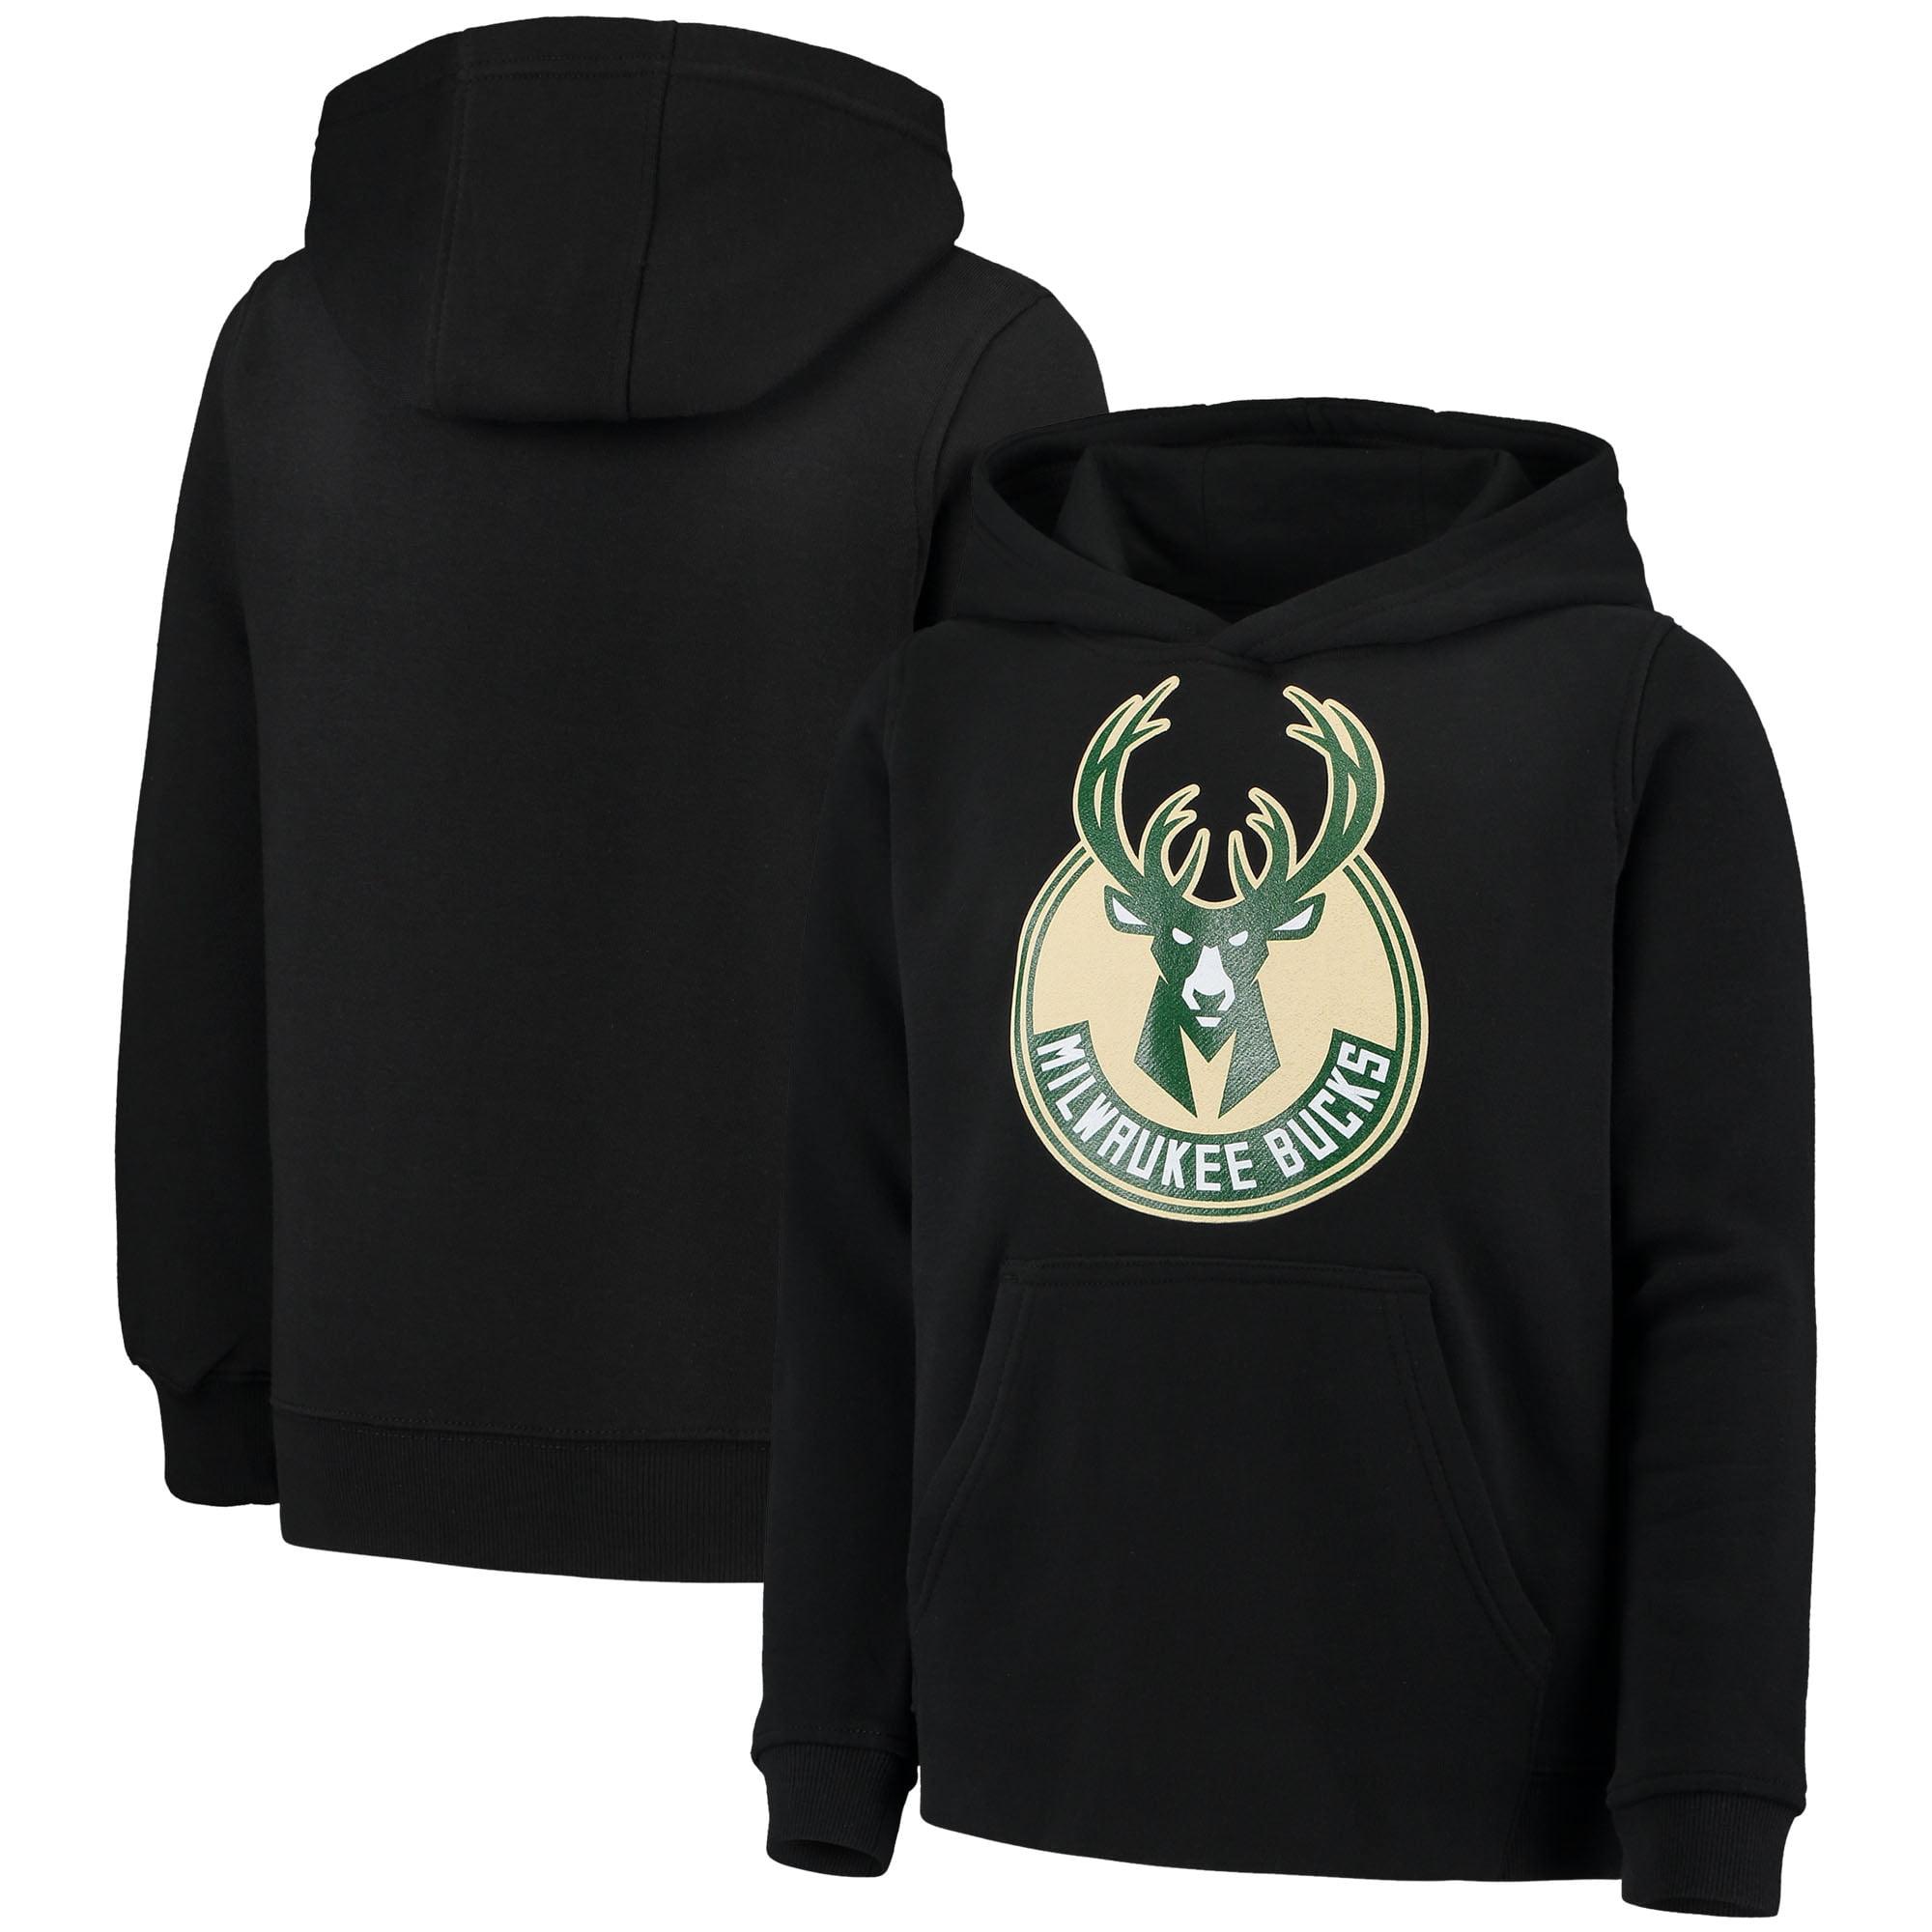 Outerstuff NHL Youth Minnesota Wild Primary Logo Fleece Hoodie